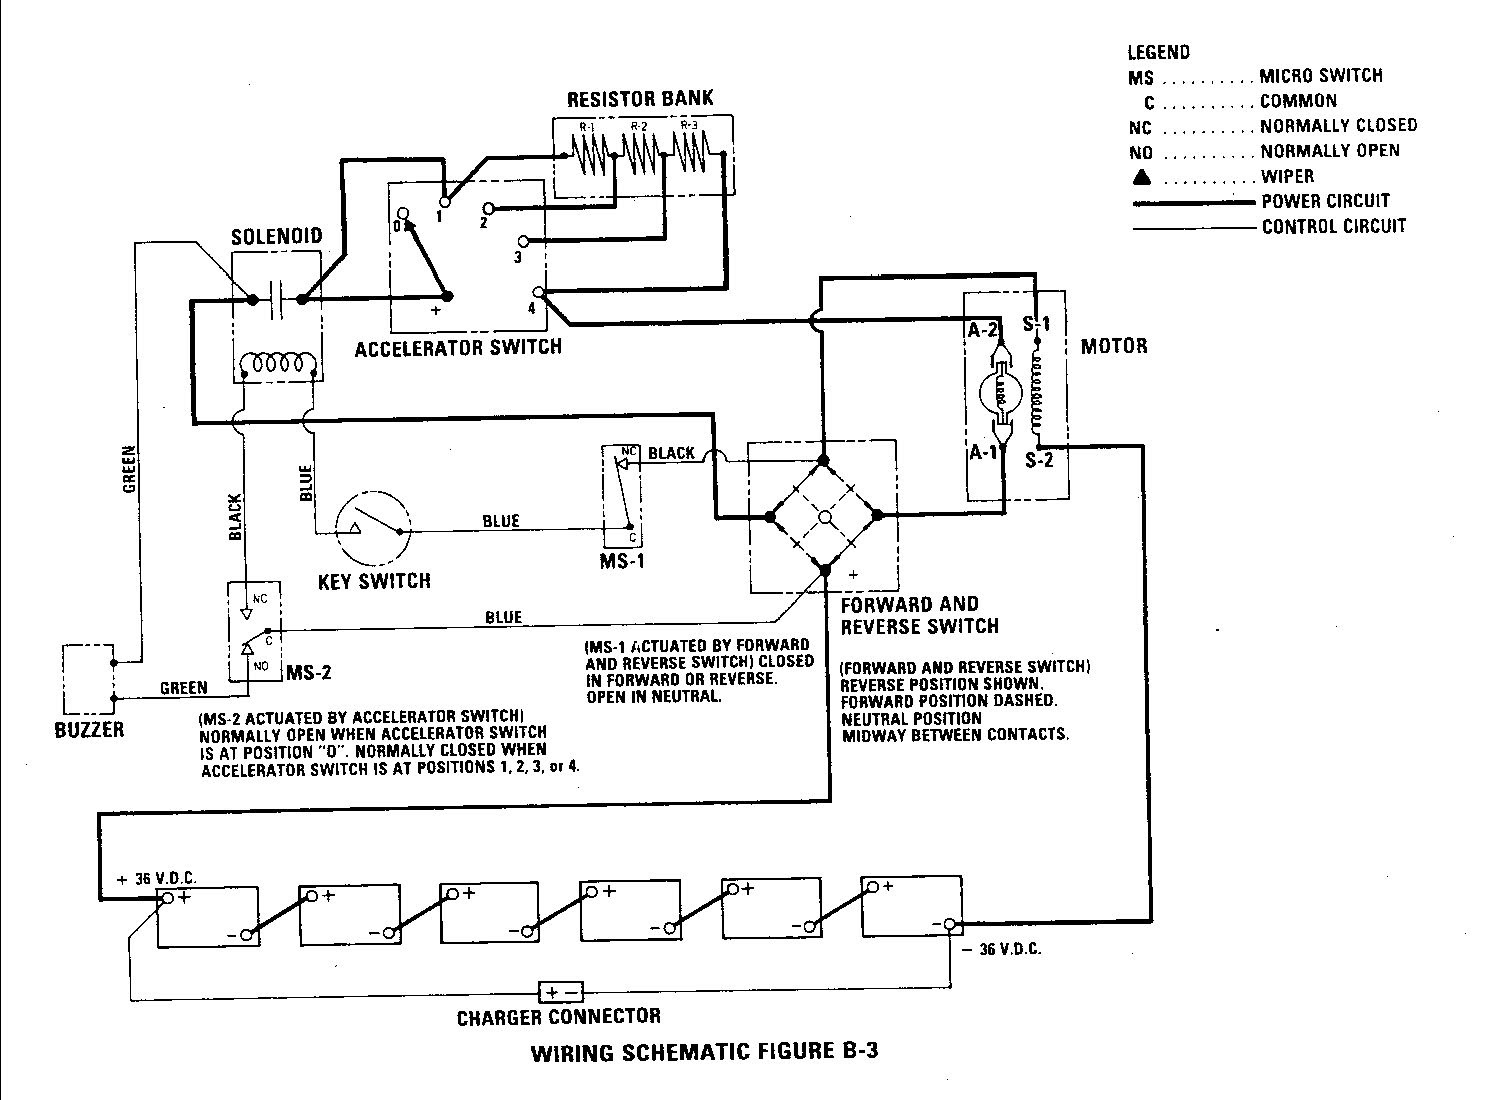 Nordskog Wiring Diagram For A